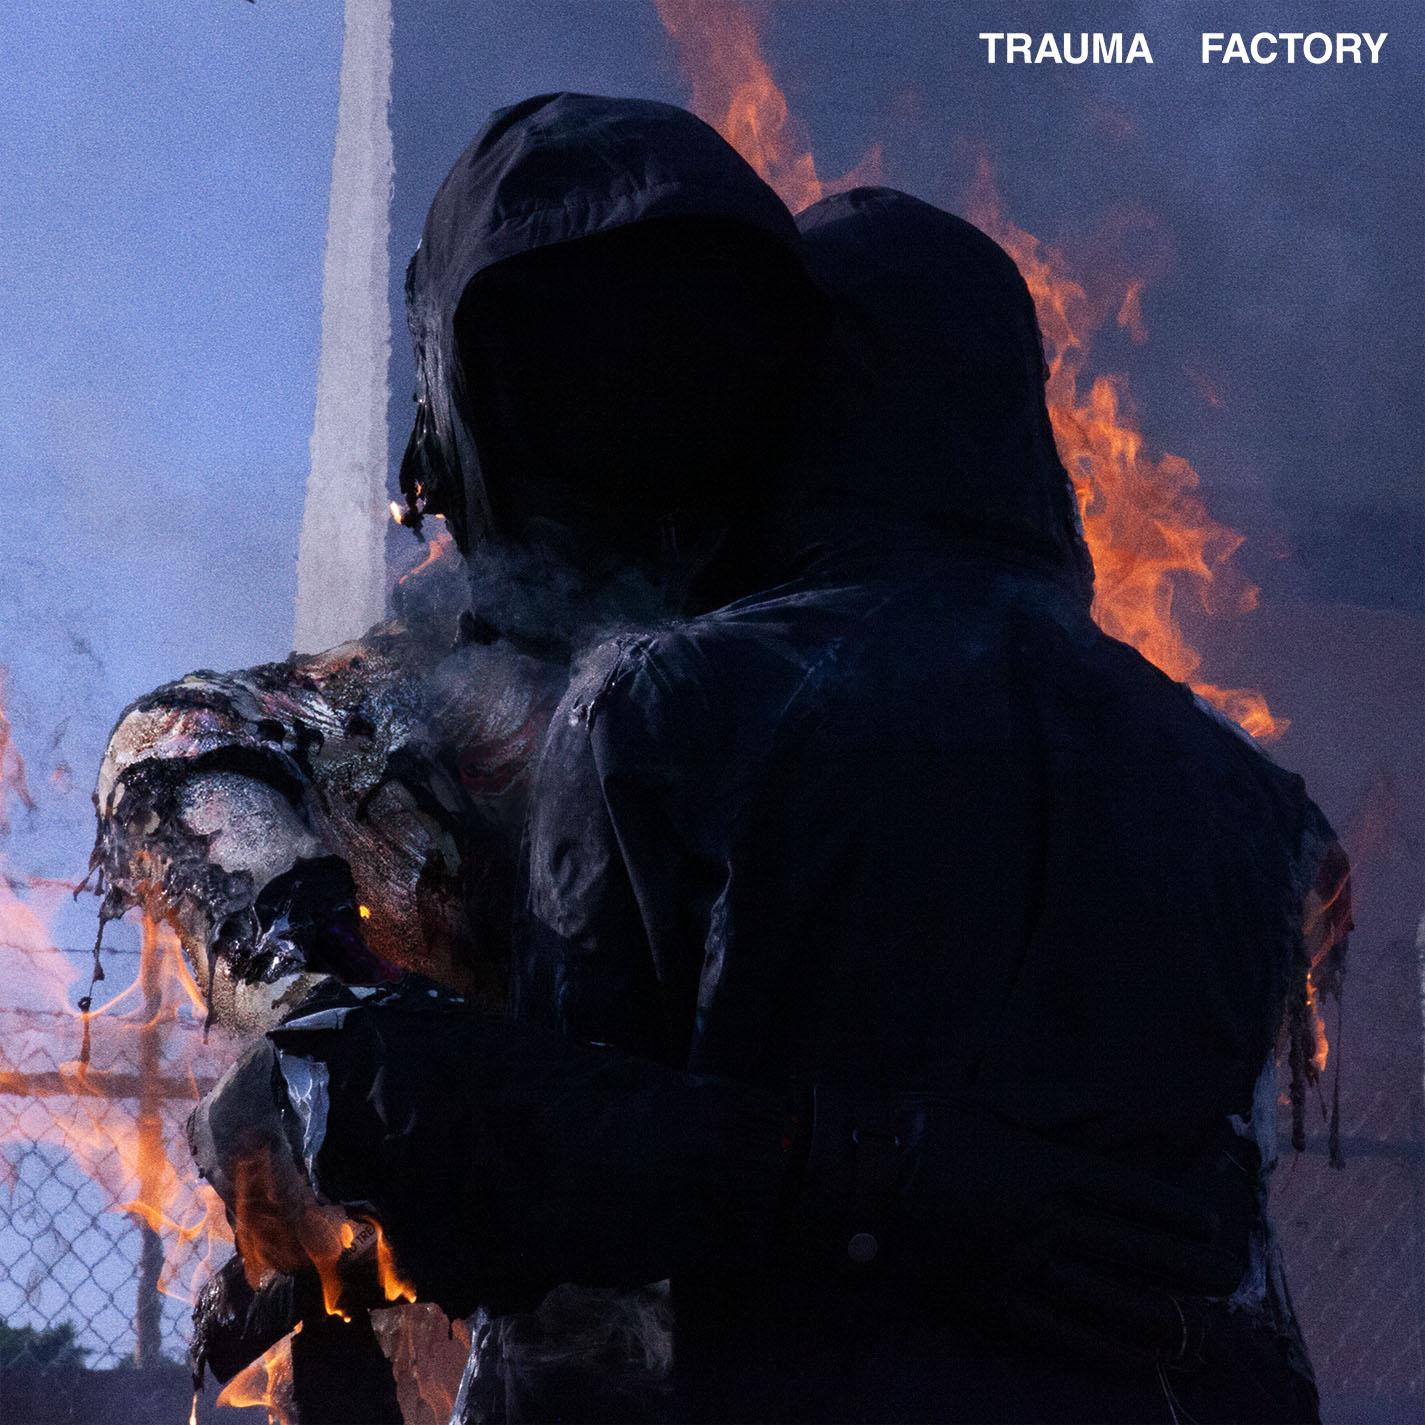 TRAUMA FACTORY DIGITAL DOWNLOAD